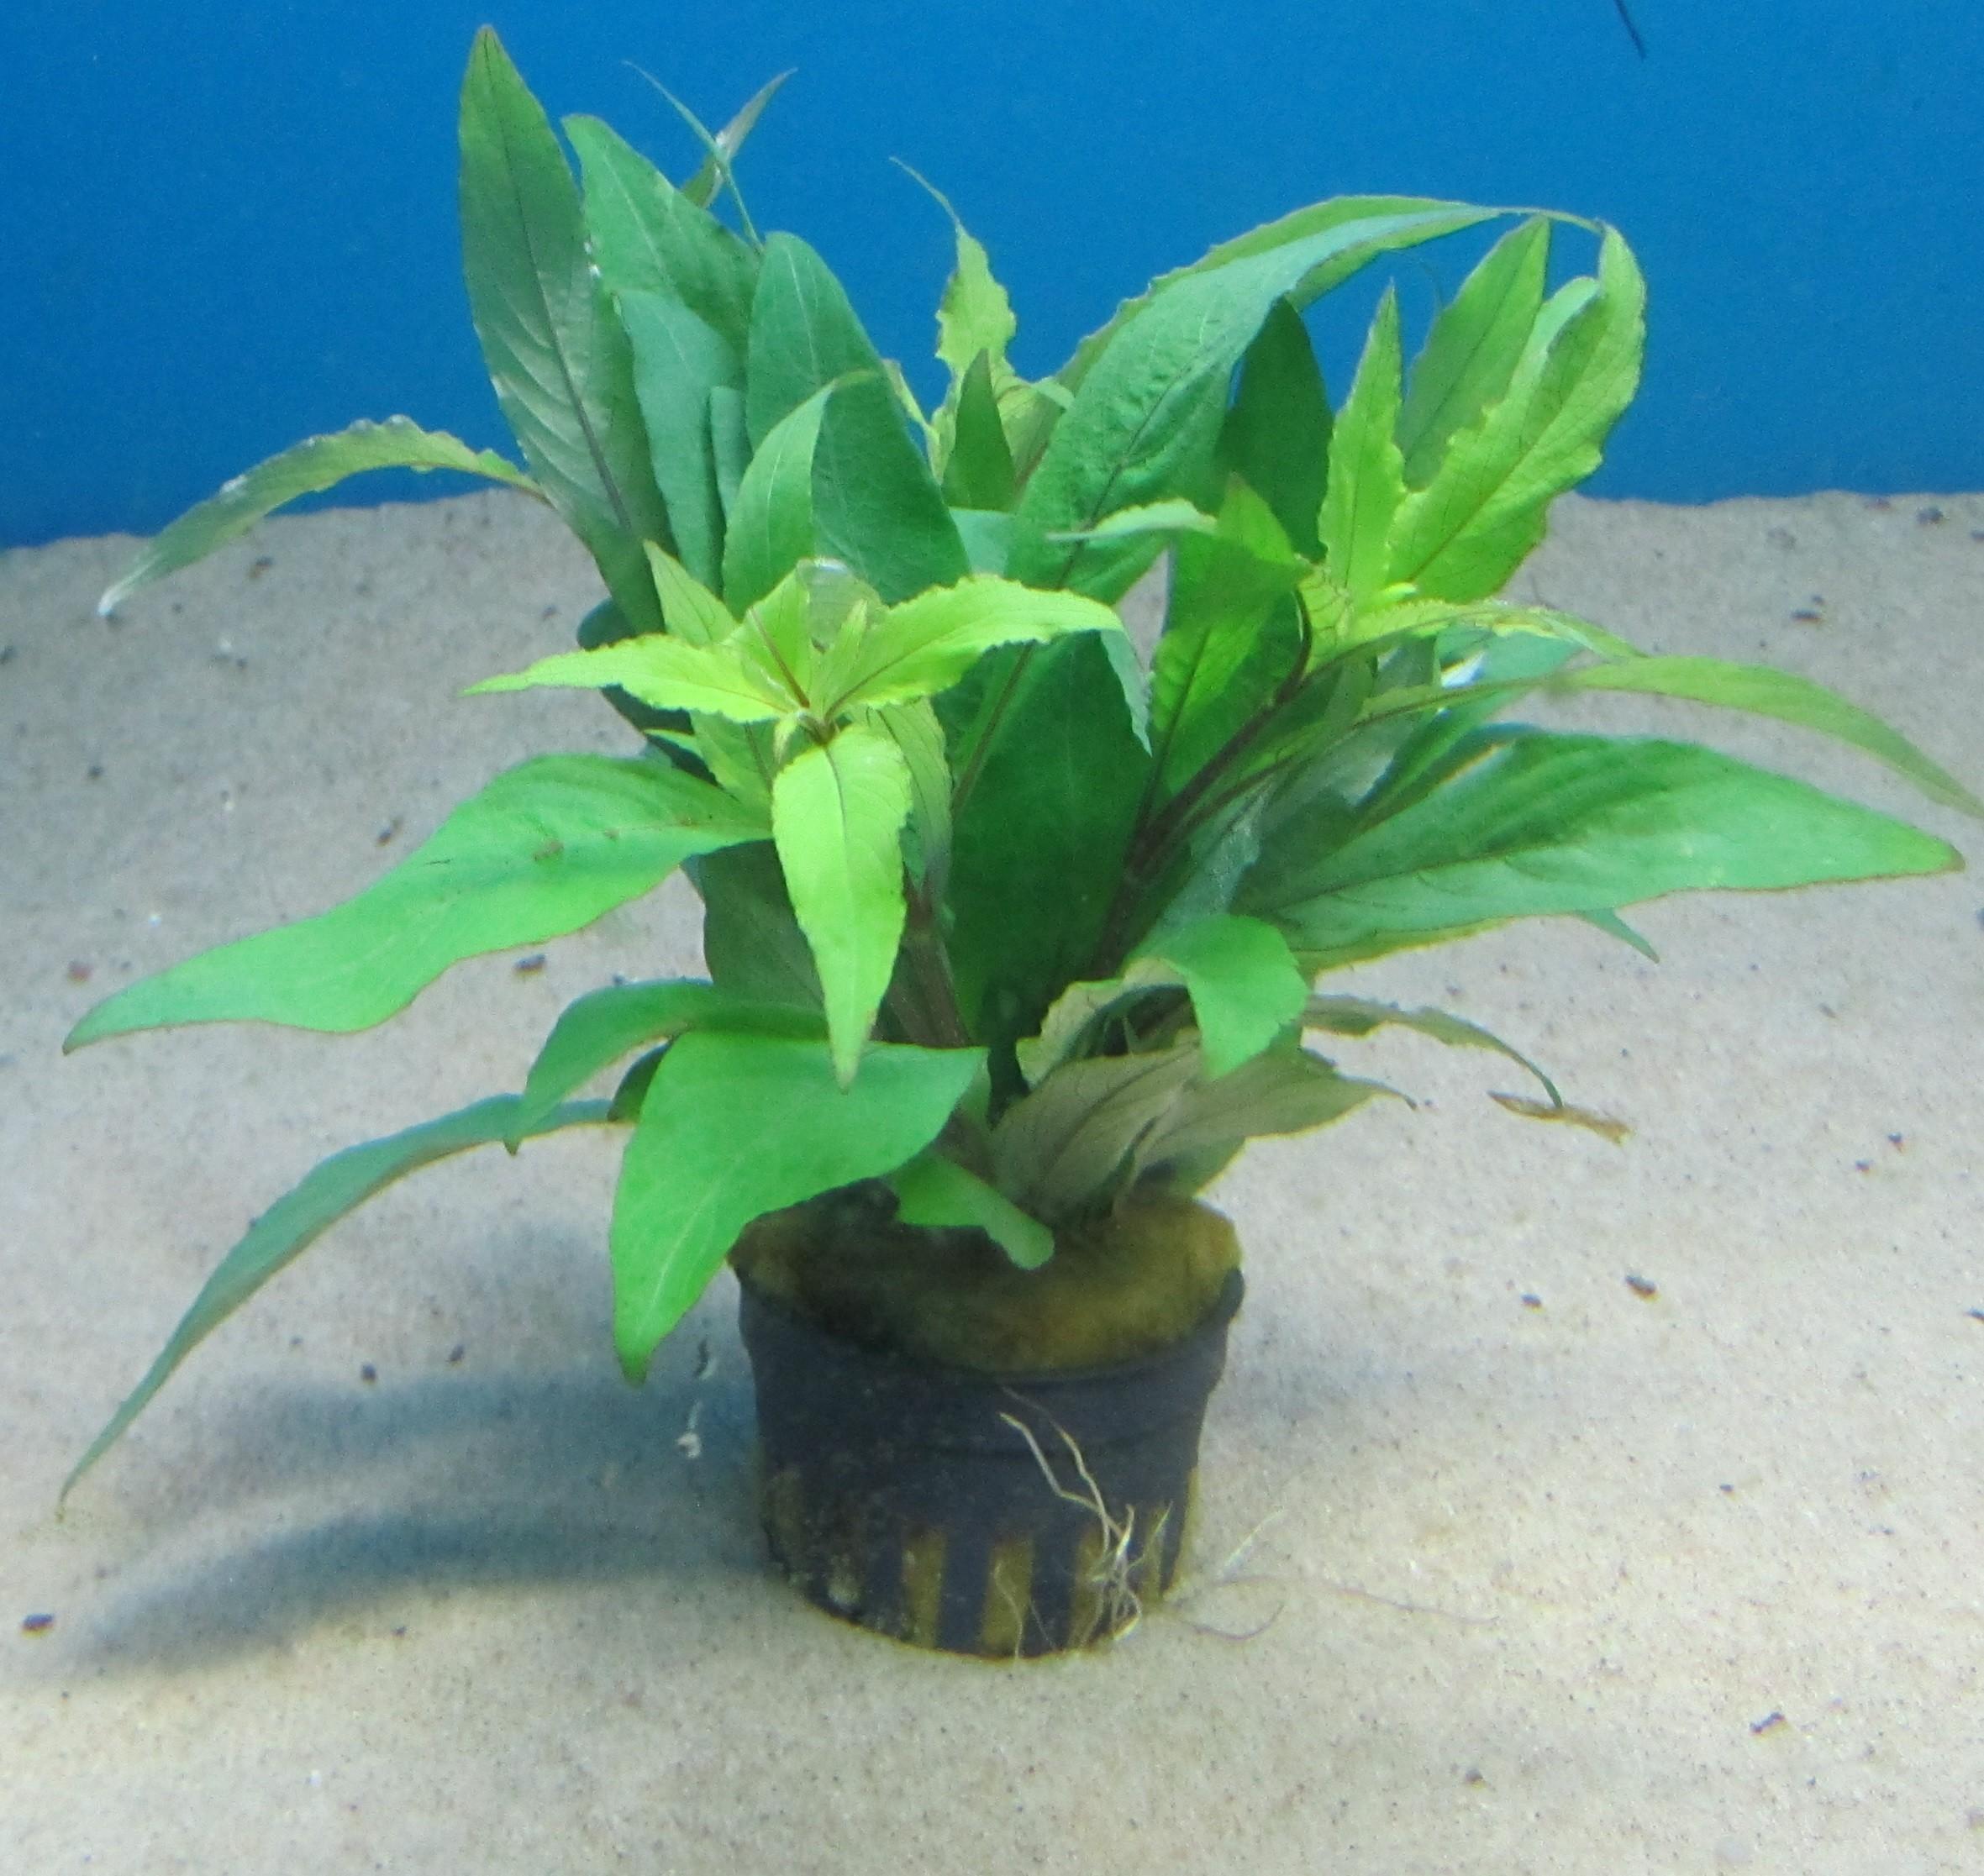 Hygrophila augustifolia / Normaphila augustifolia